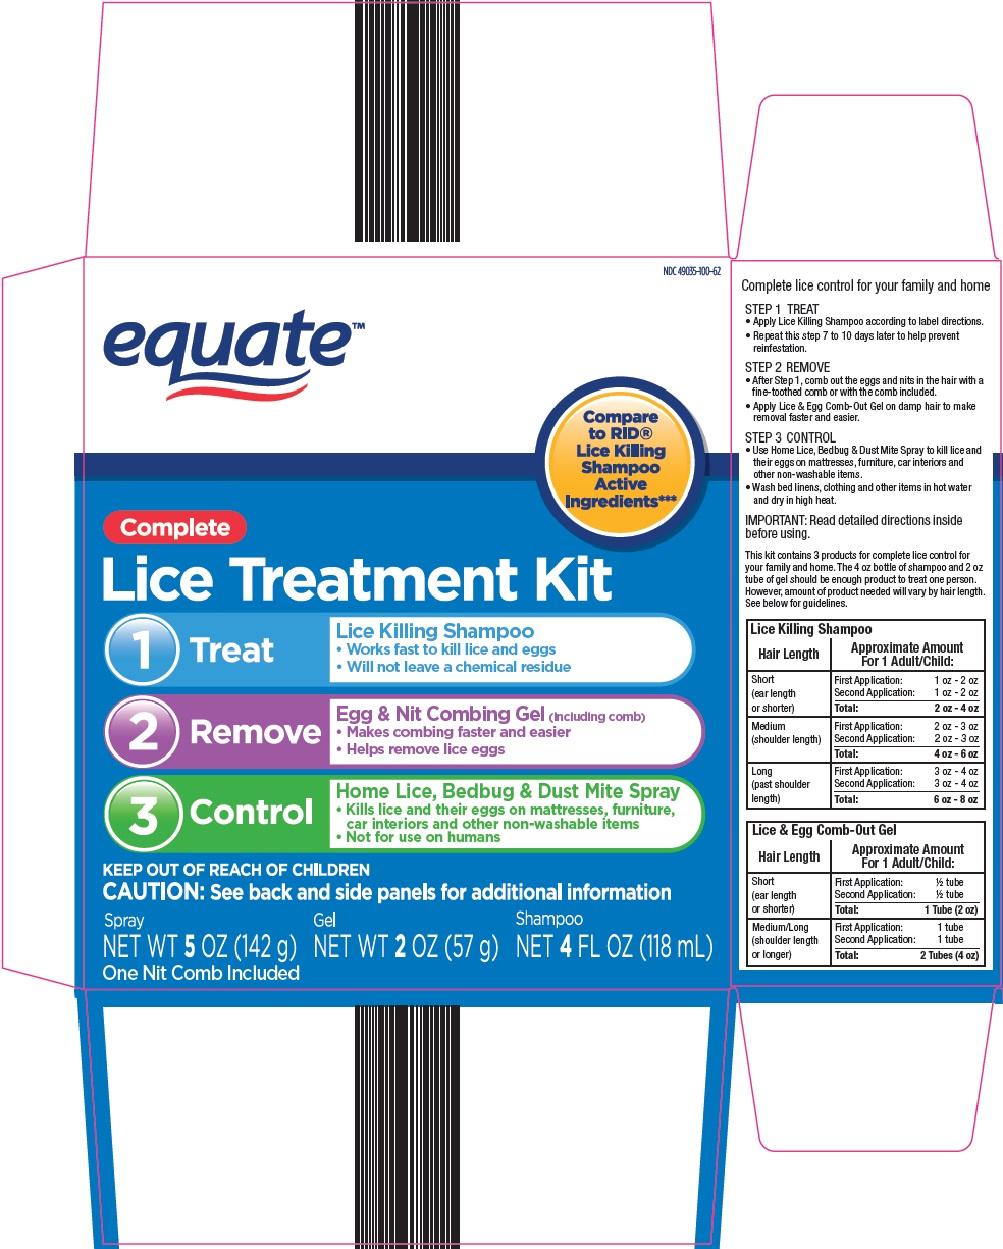 Equate Lice Treatment Kit image 1